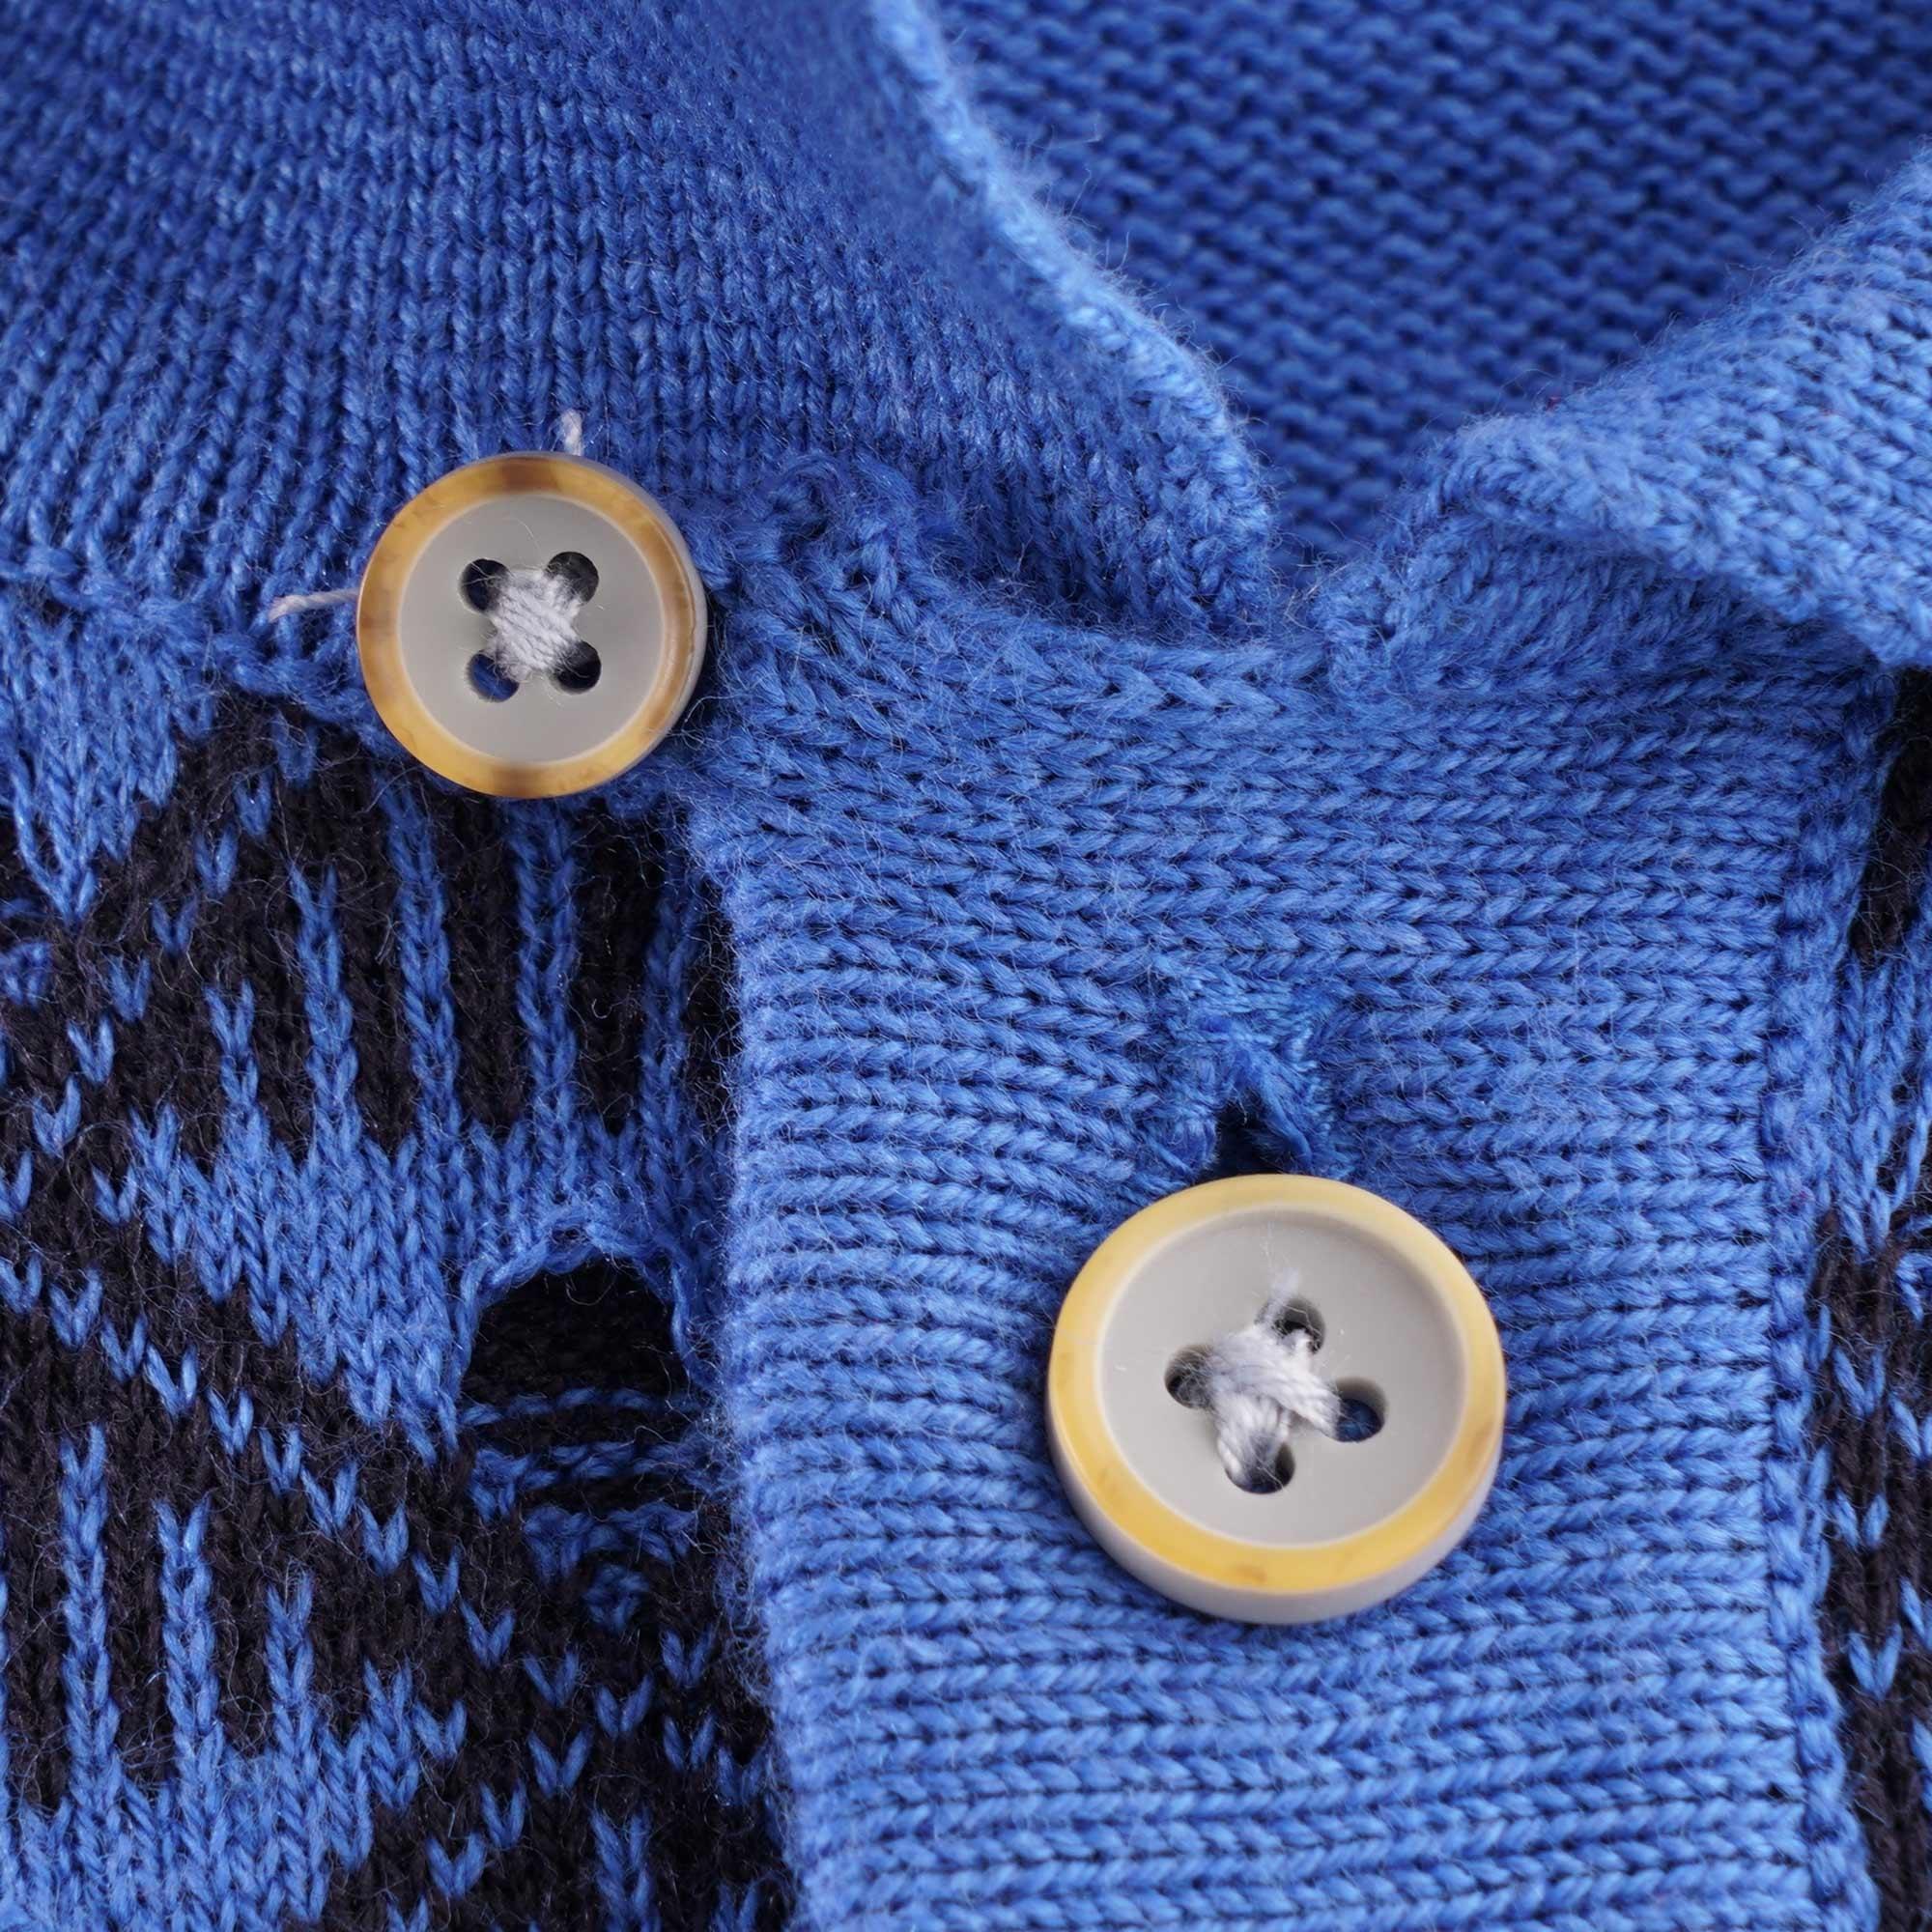 Gabicci Collared Knitted Polo Wool Blend £9.99 BNWT Medium Sunrise//Navy